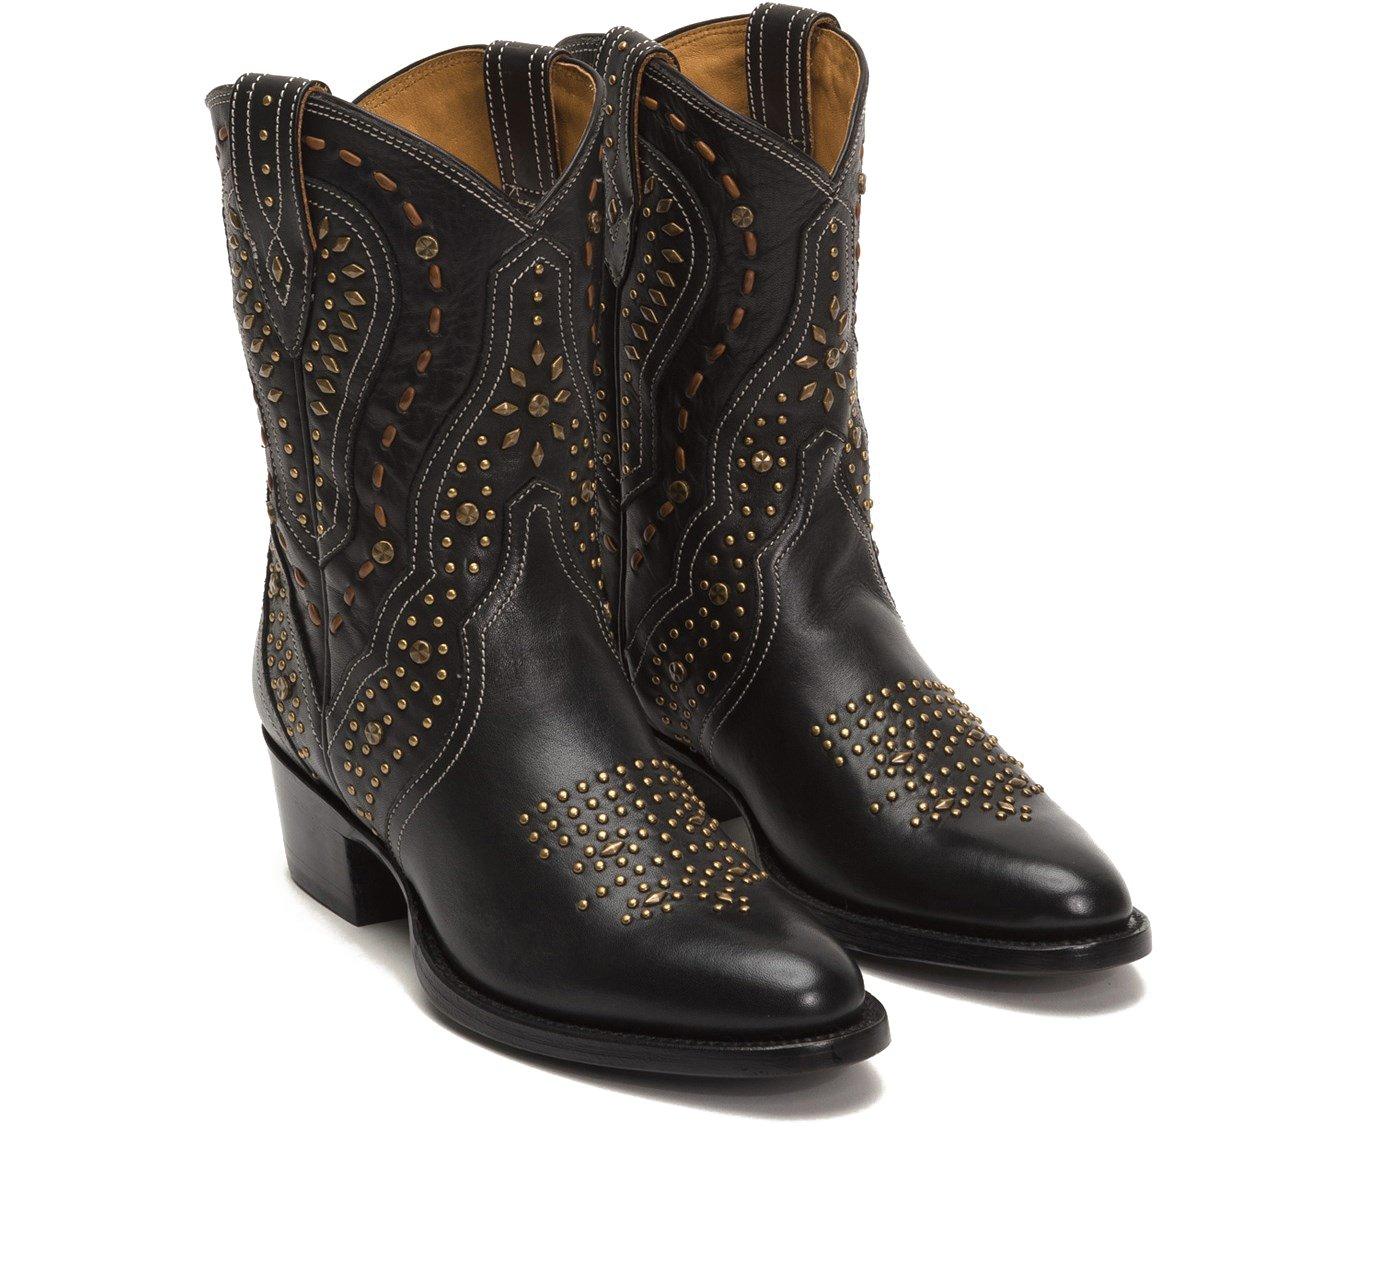 FRYE 79127 Women's Kelsea Stud Short Boot B076KXY92Q 10 B(M) US|Black